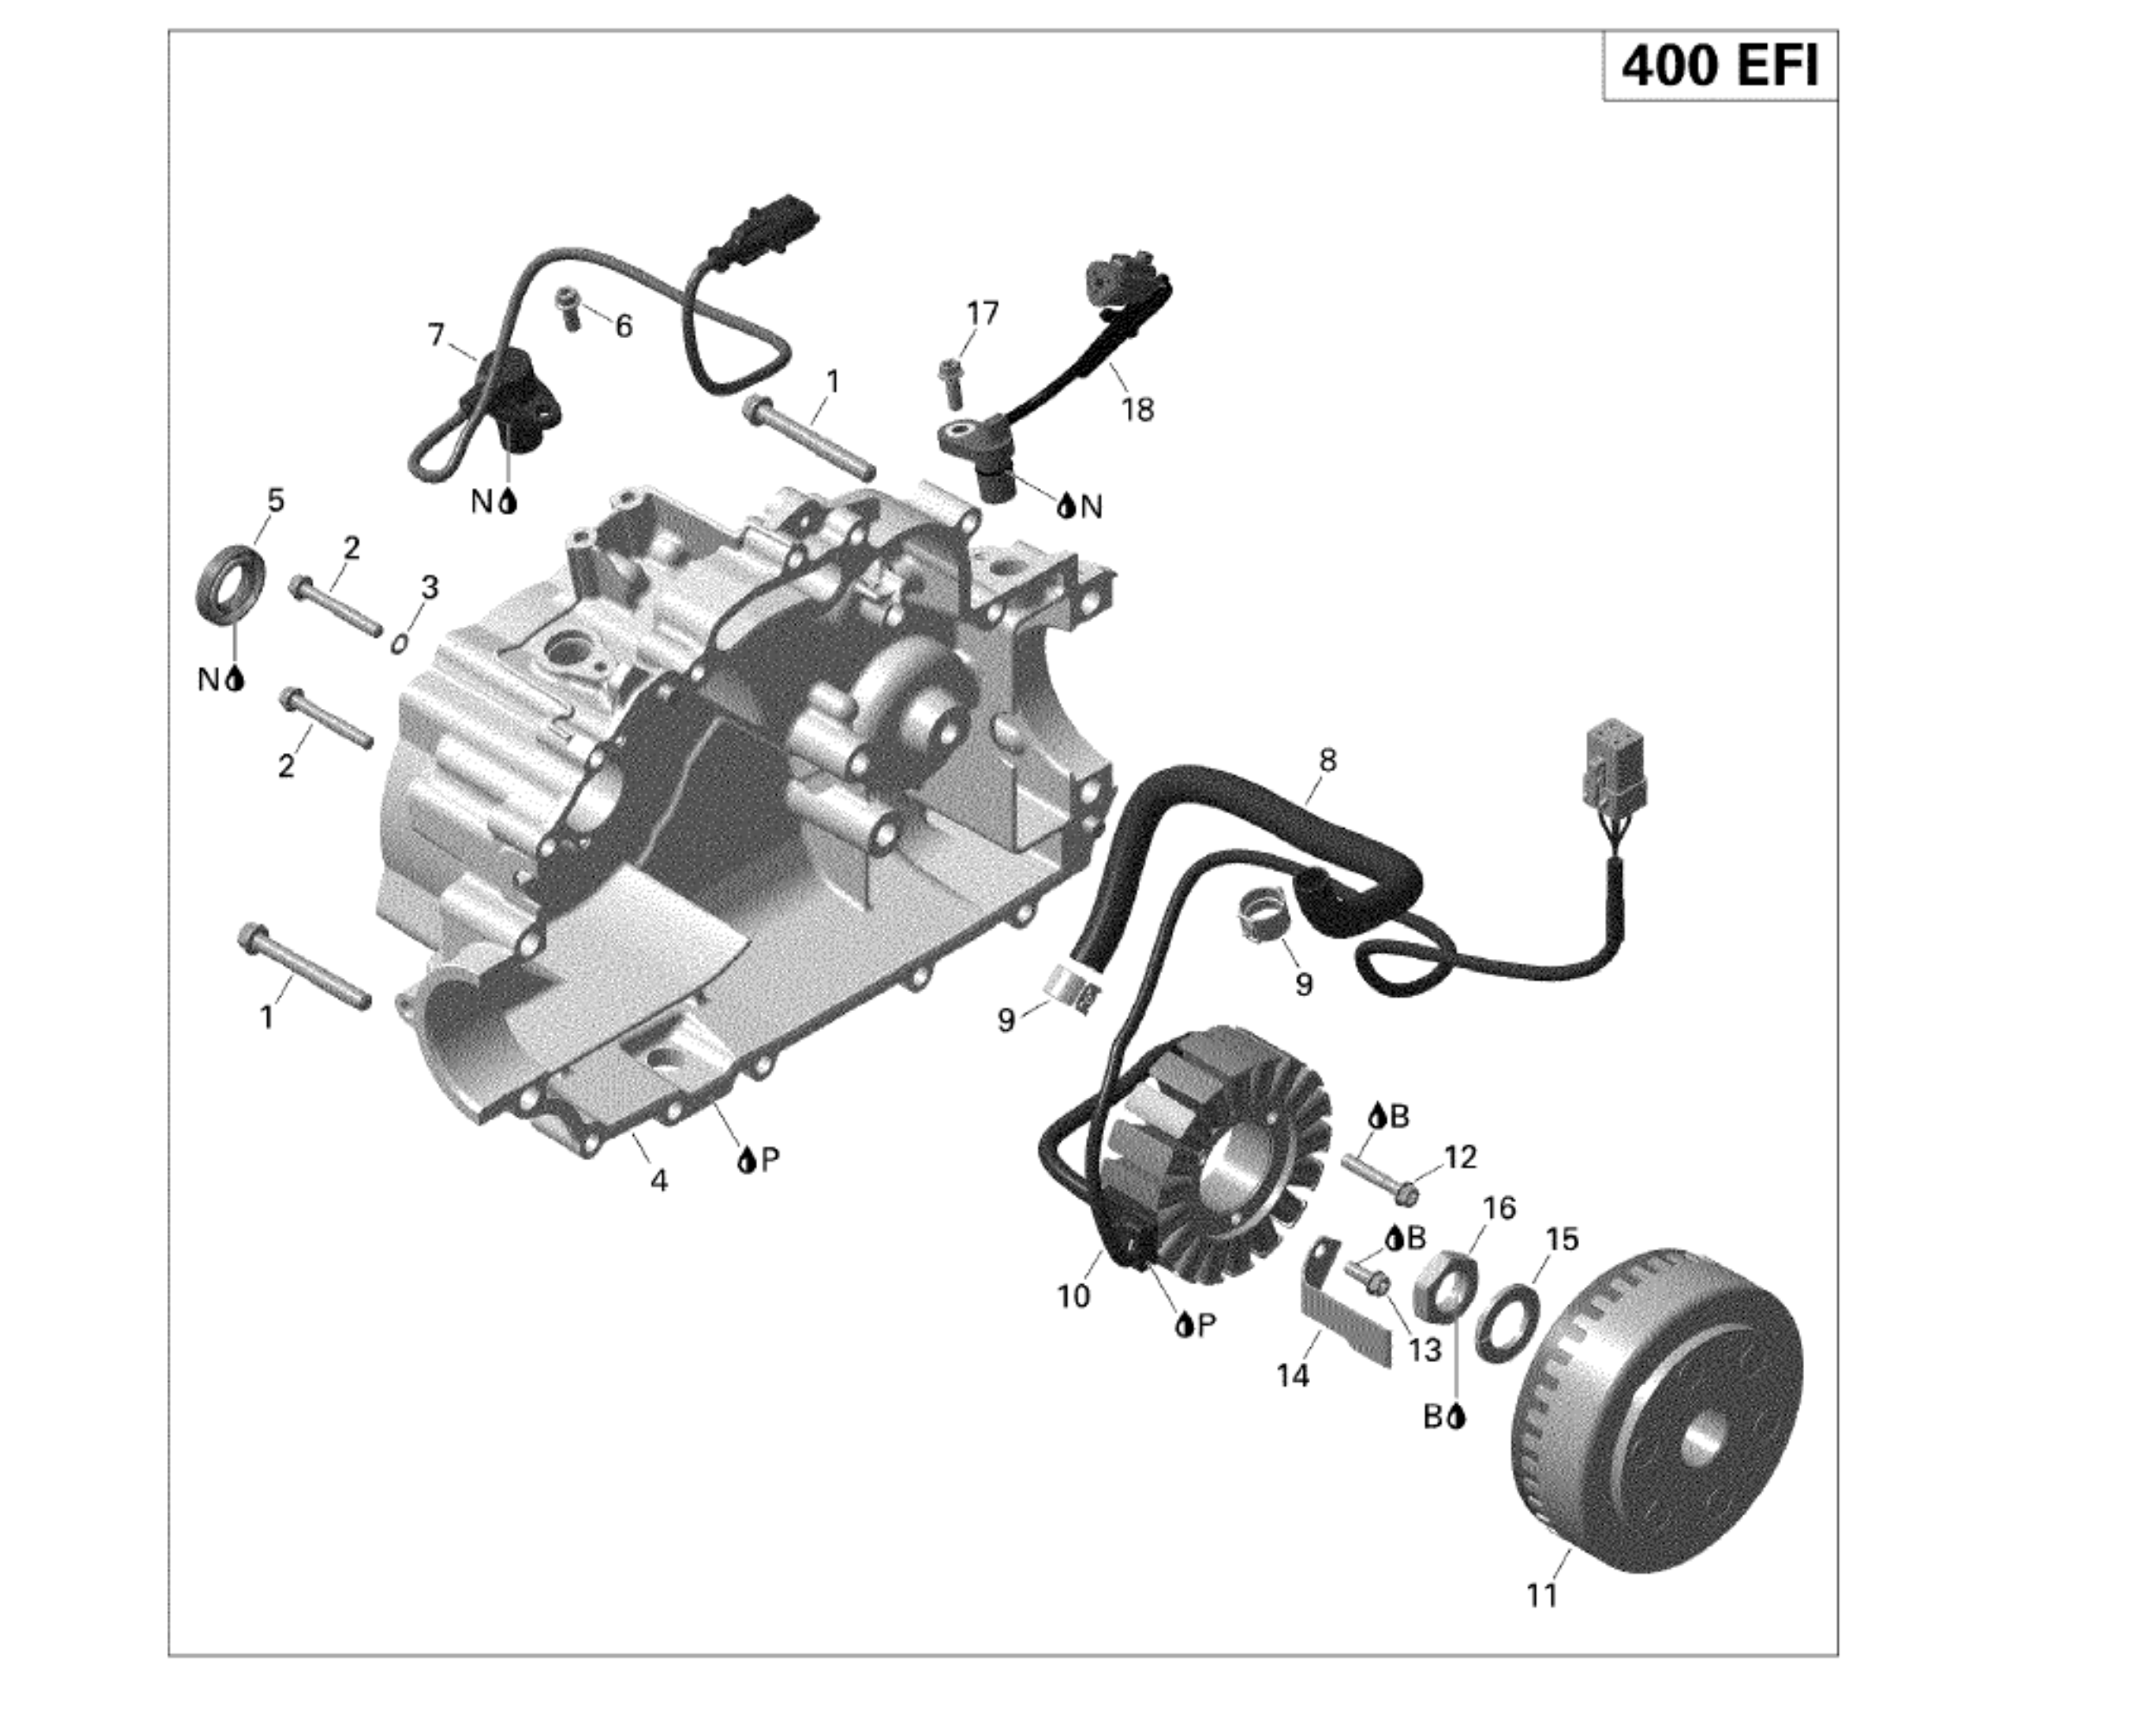 Lichtmaschine | Motor & Rahmen | Outlander 400 EFI | 2010 ...